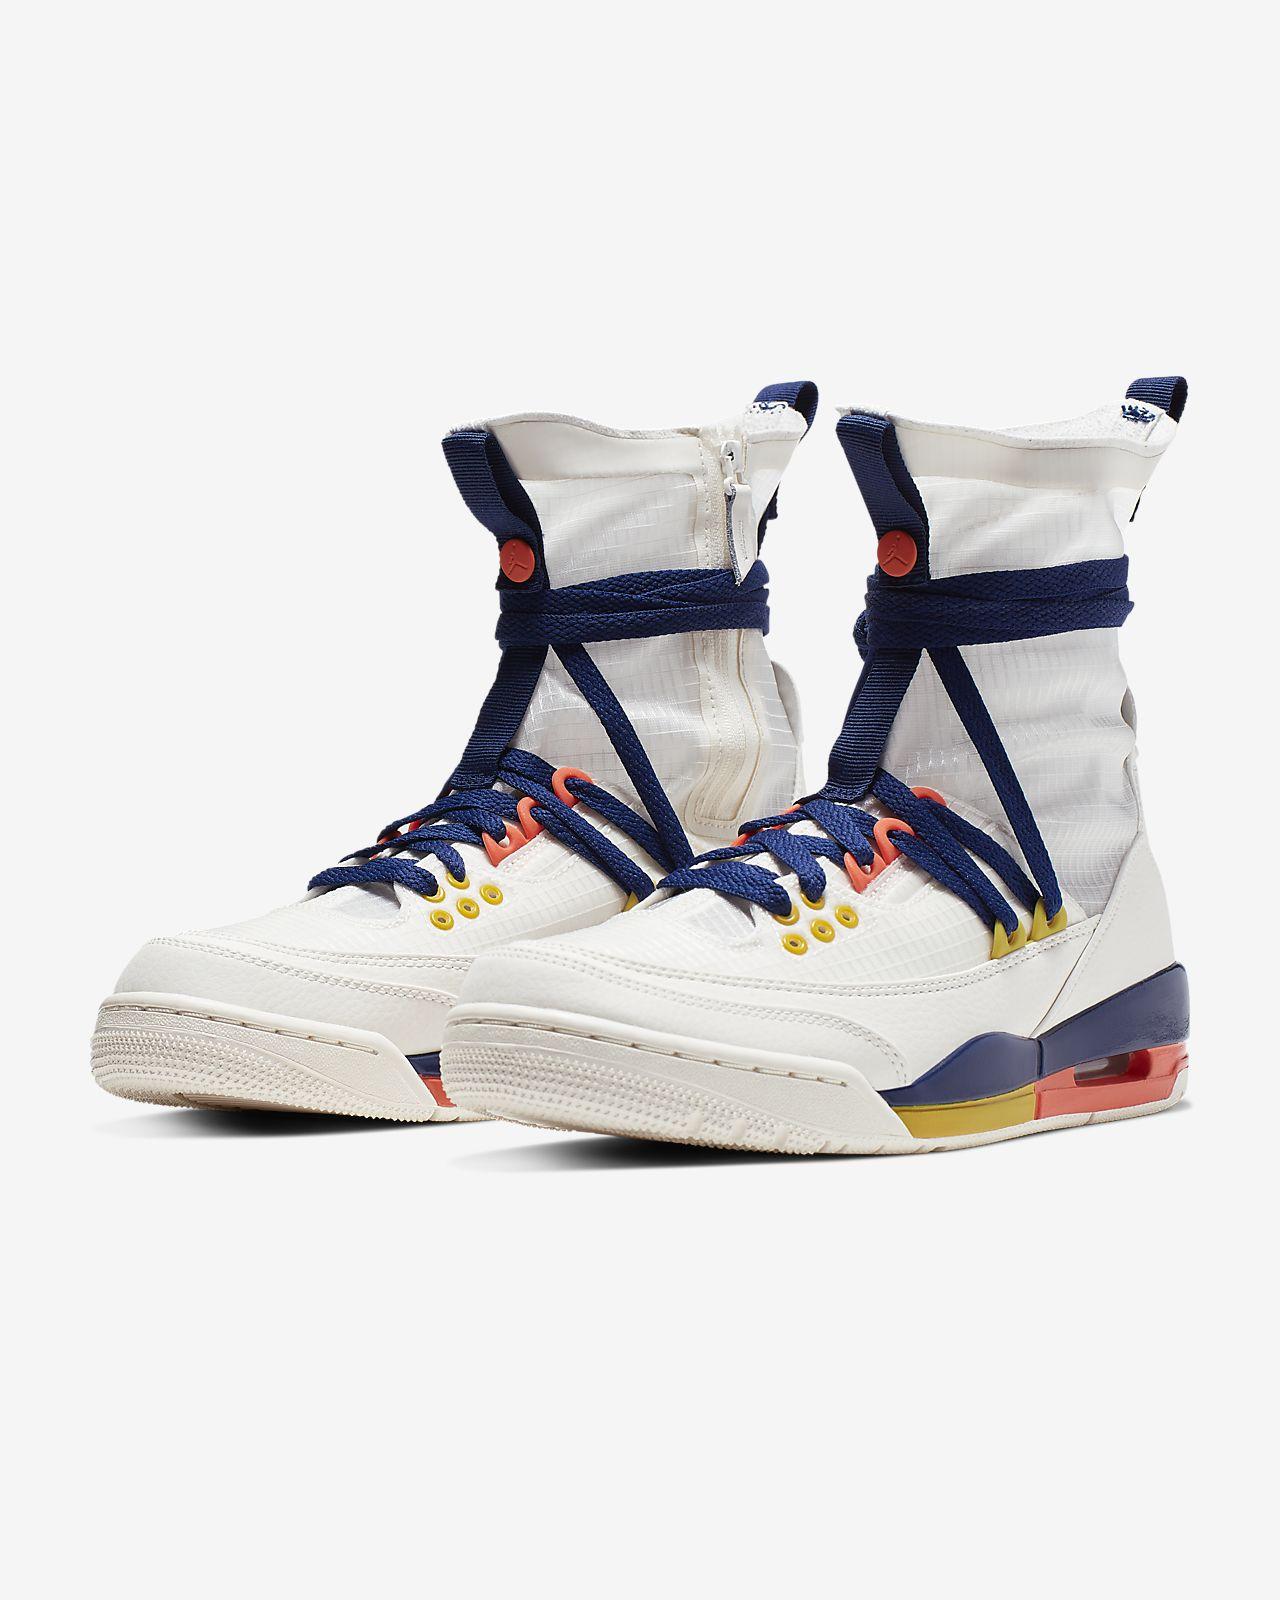 00fc80667fbb55 Air Jordan 3 Retro Explorer Lite XX Women s Shoe. Nike.com